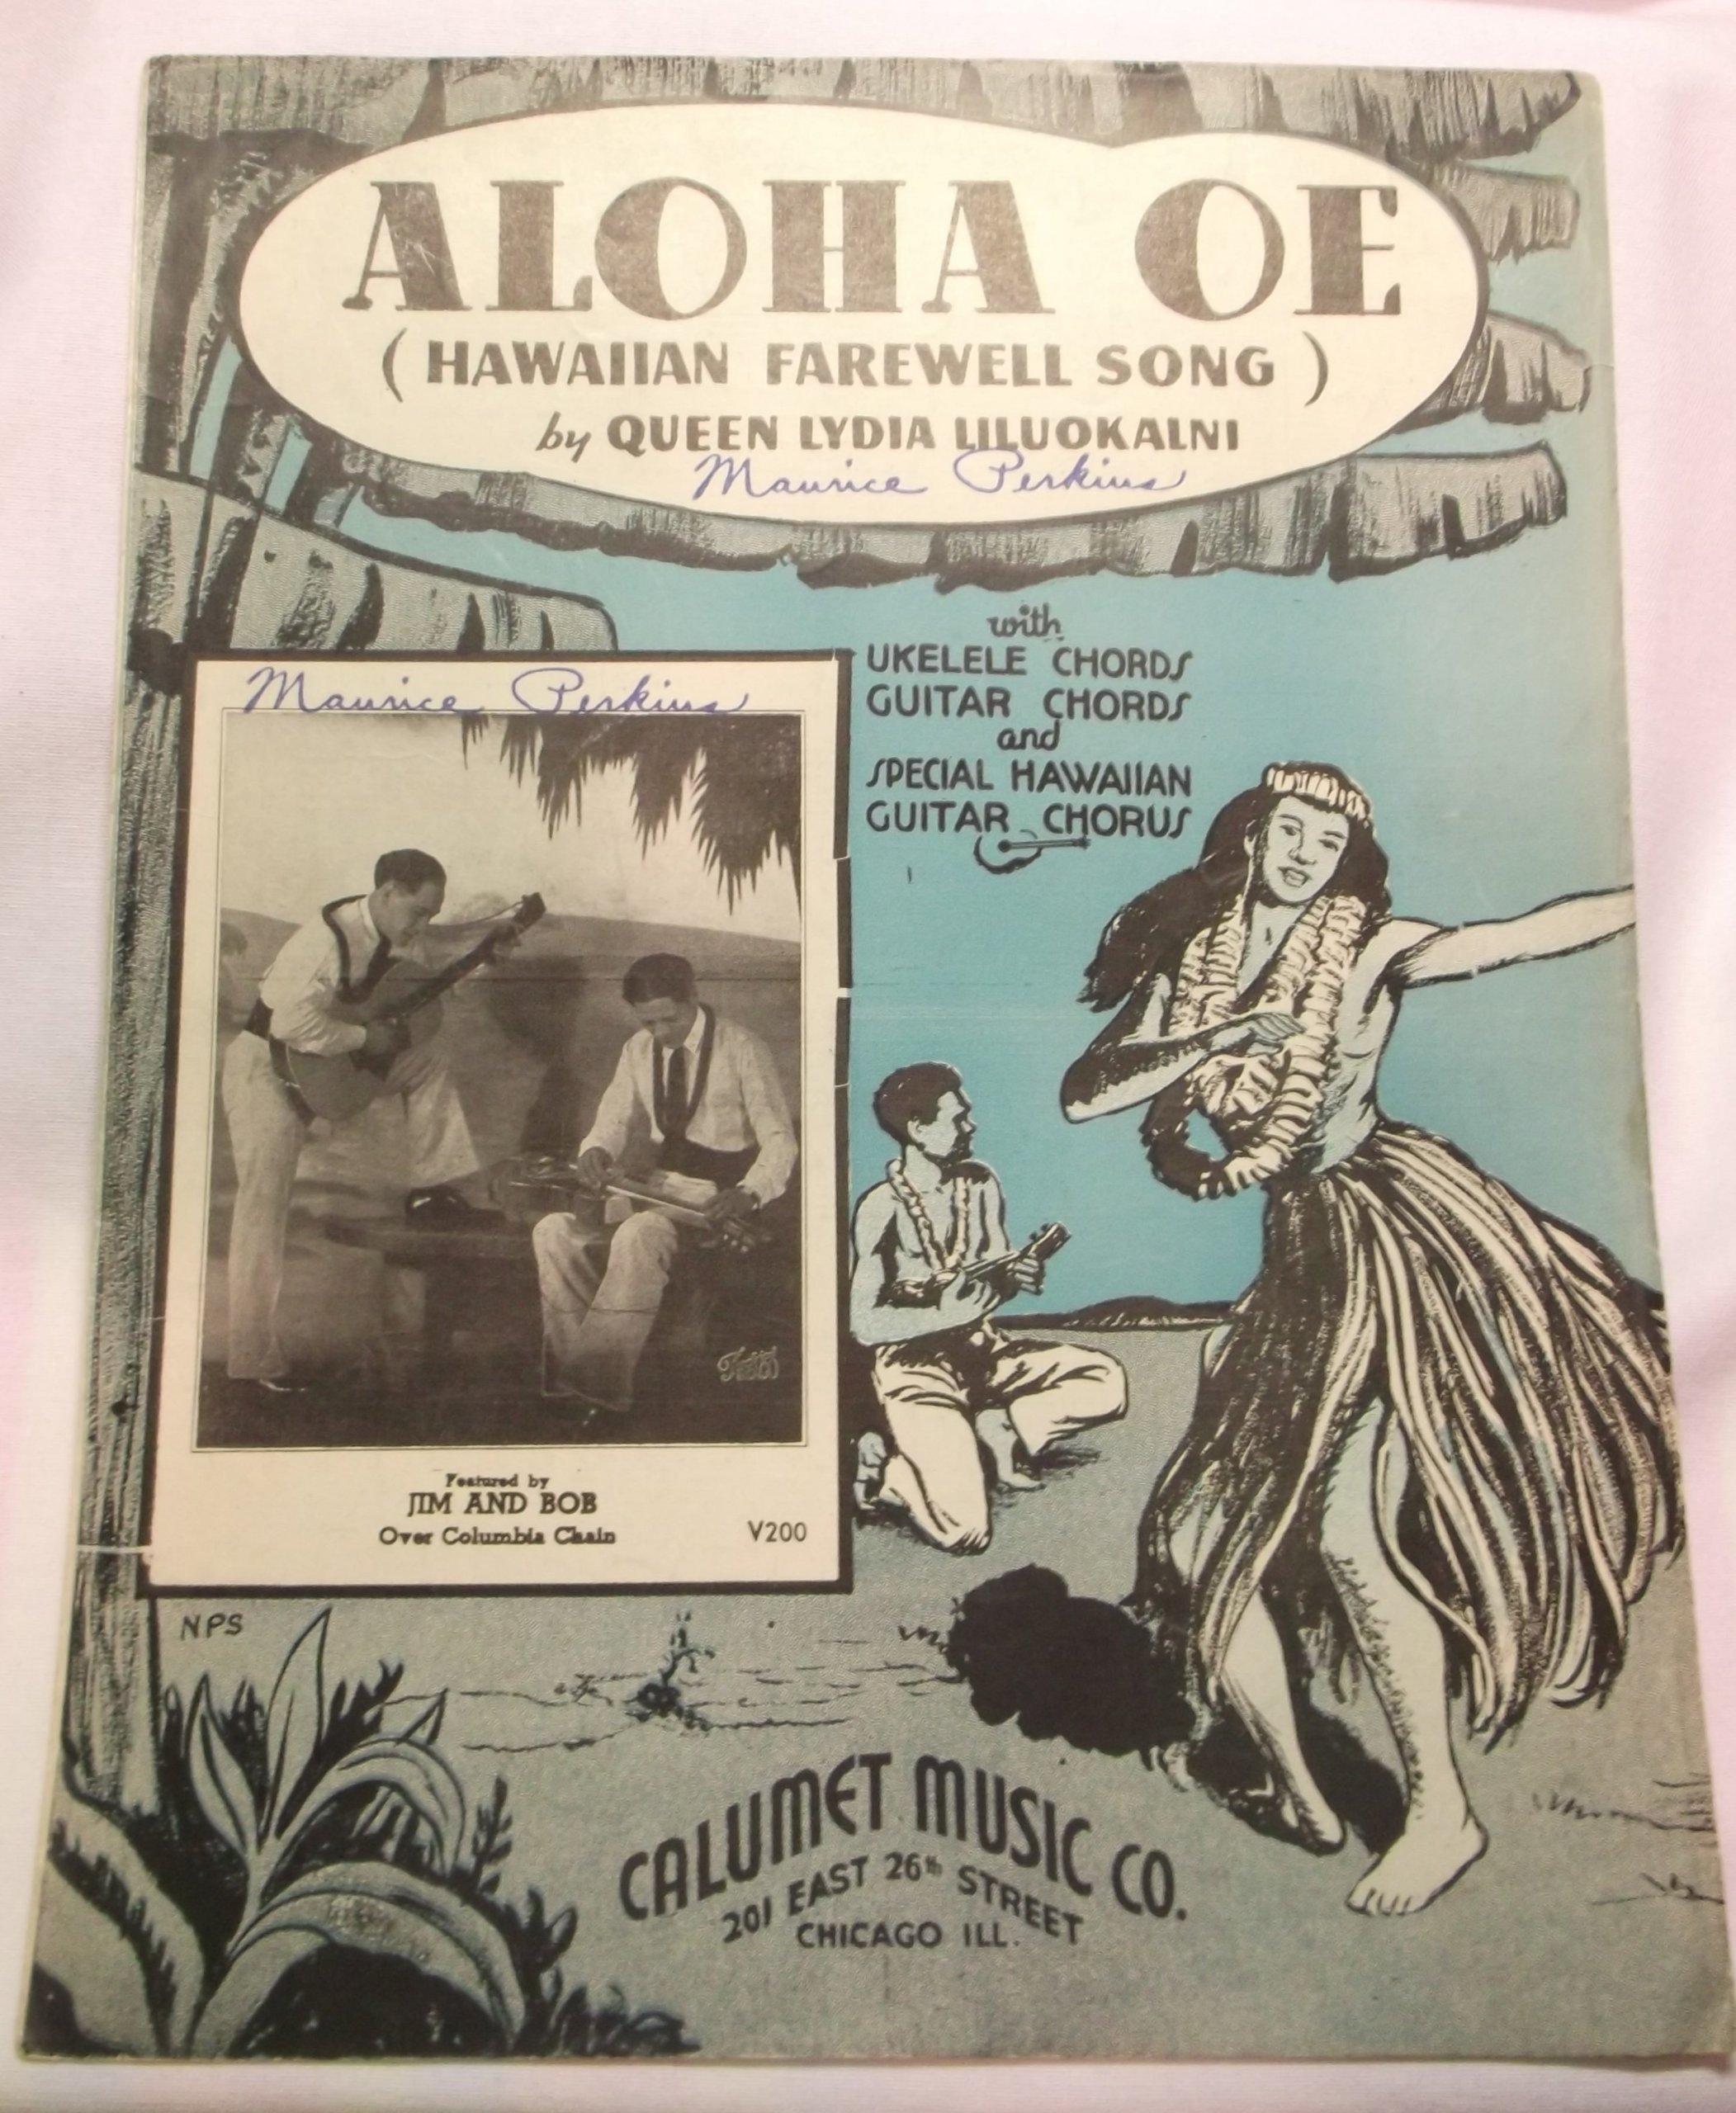 Amazon Aloha Oe Hawaiian Farewell Song Ukeguitar Chords